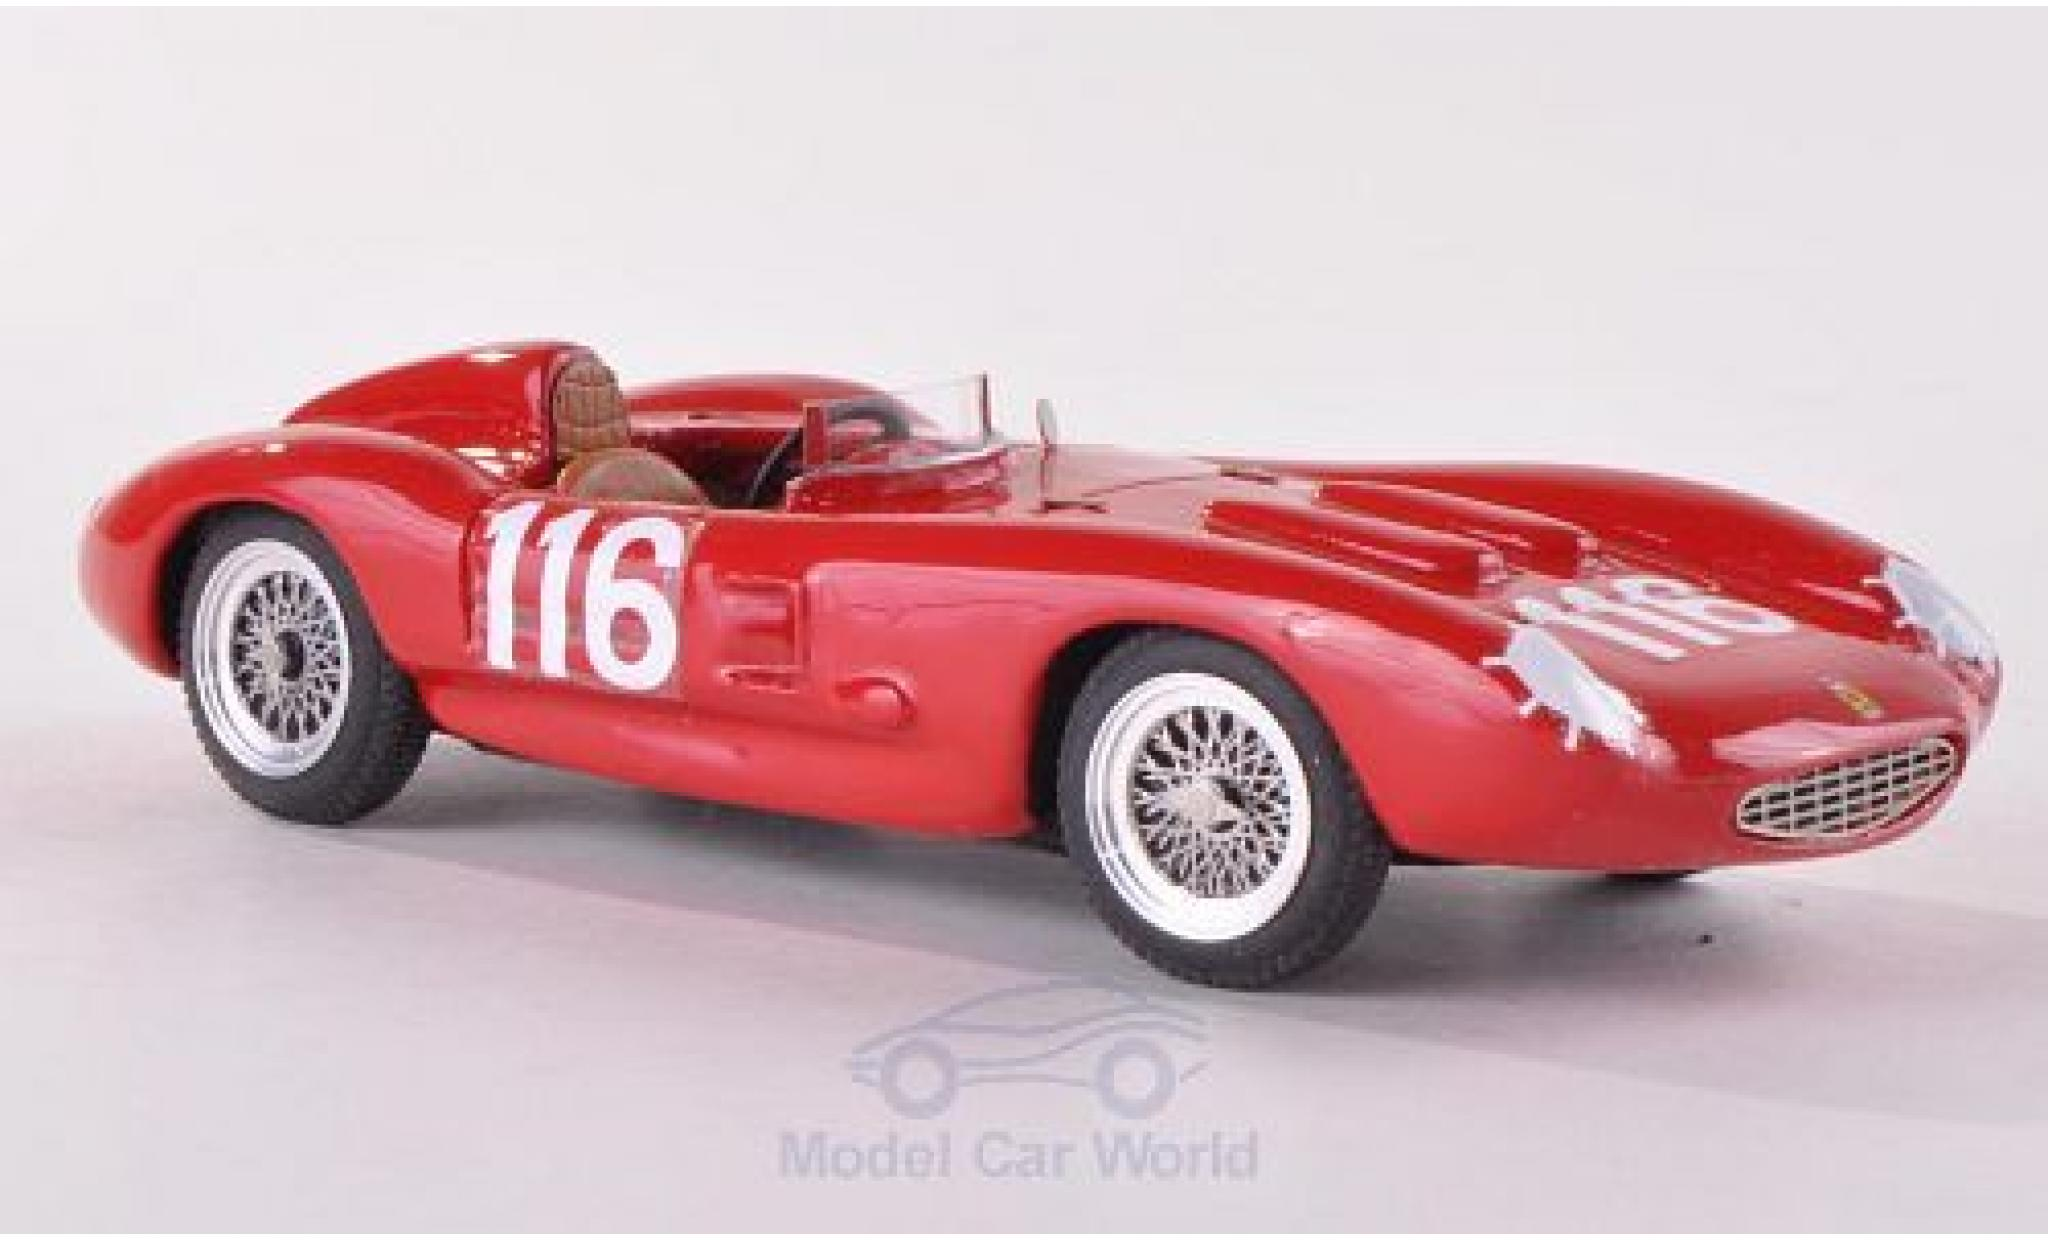 Ferrari 857 1/43 Jolly Model S Targa Florio No.116 1955 R.Manzon ohne Vitrine